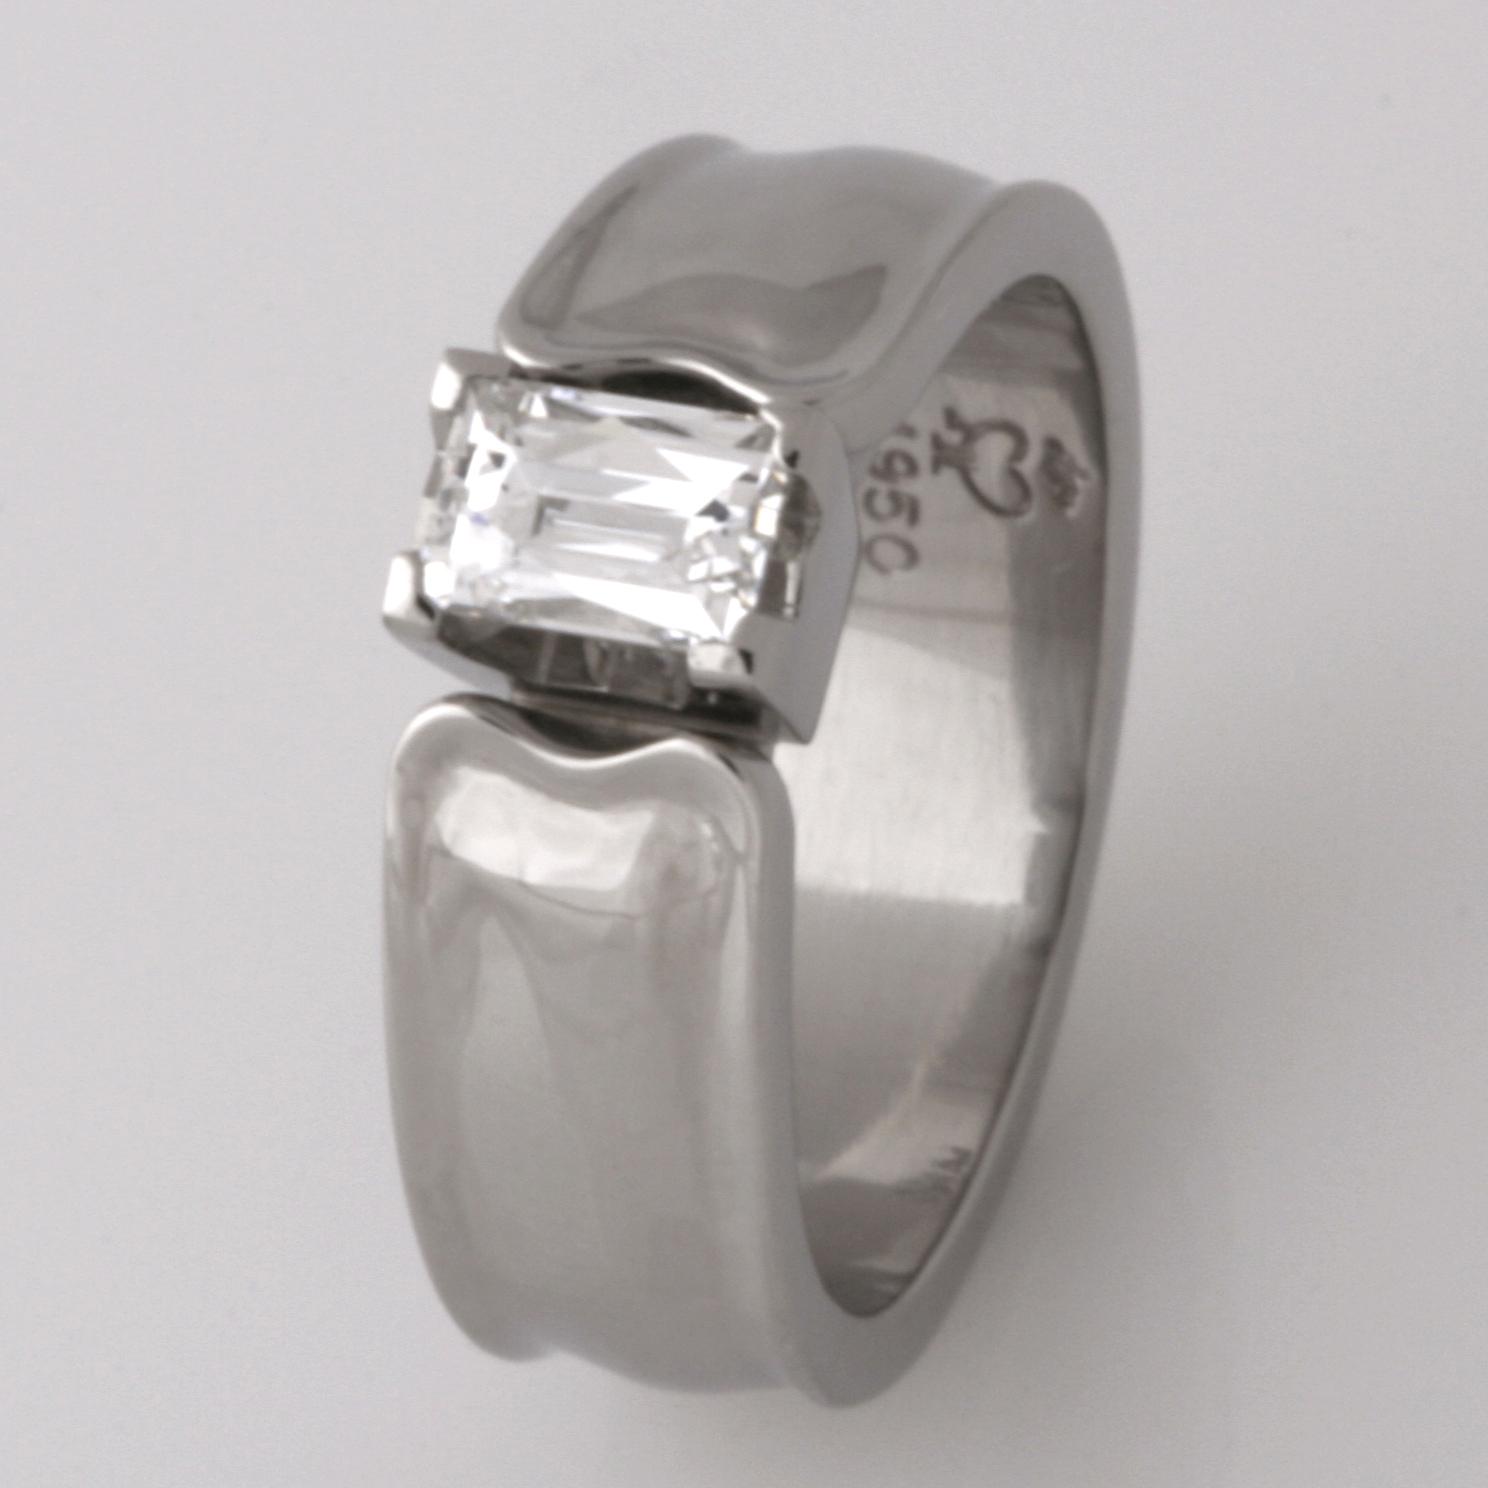 Handmade ladies palladium engagement ring featuring a 'Tycoon' cut diamond